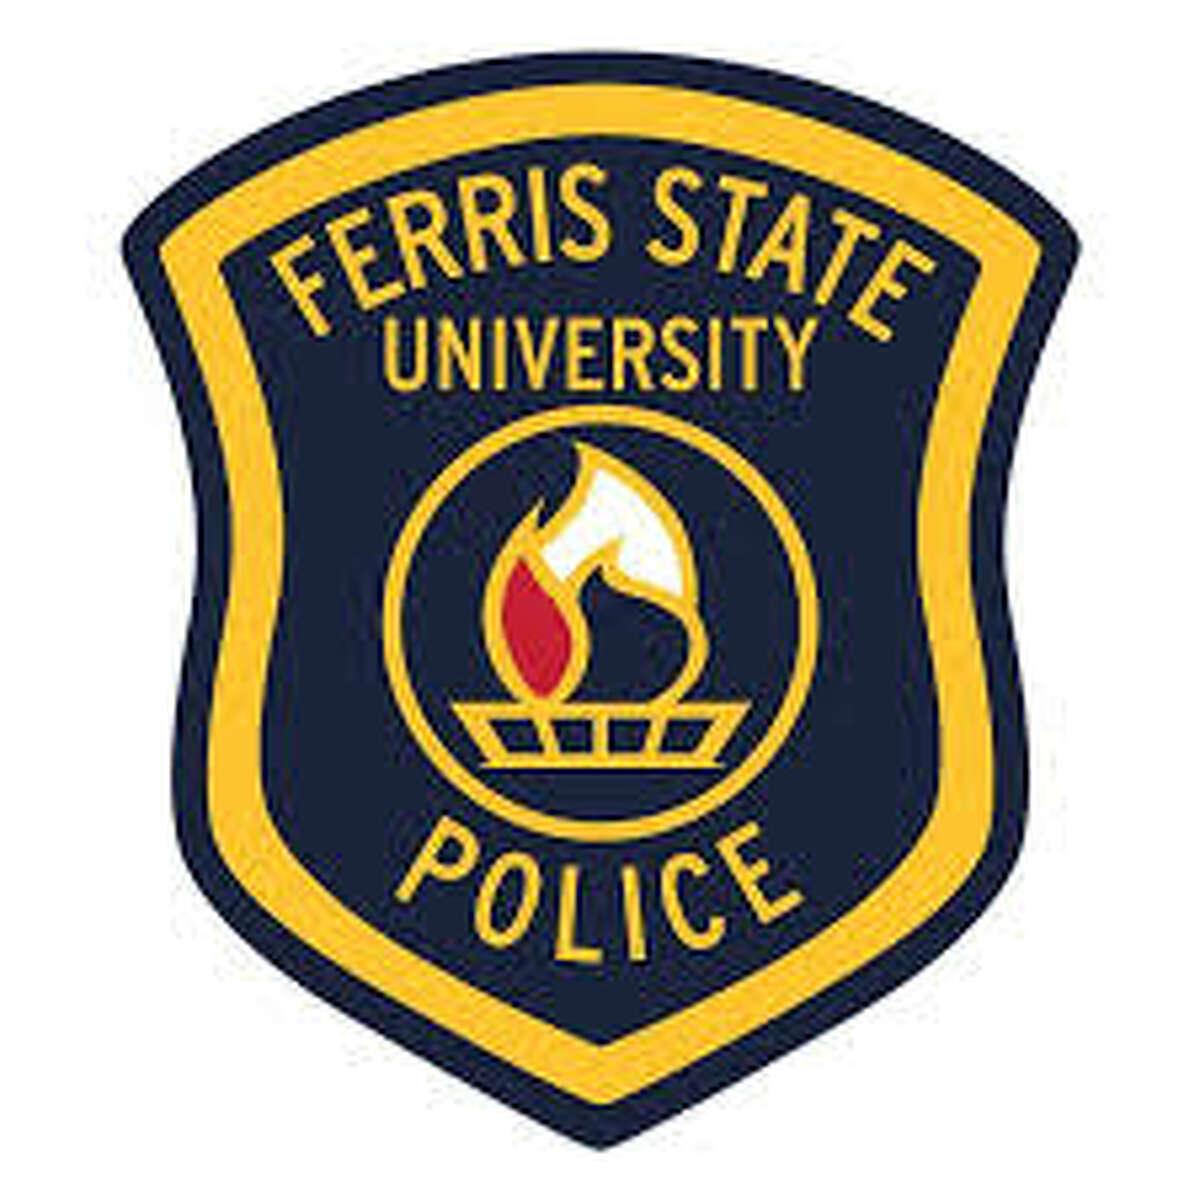 Ferris State University Police Department